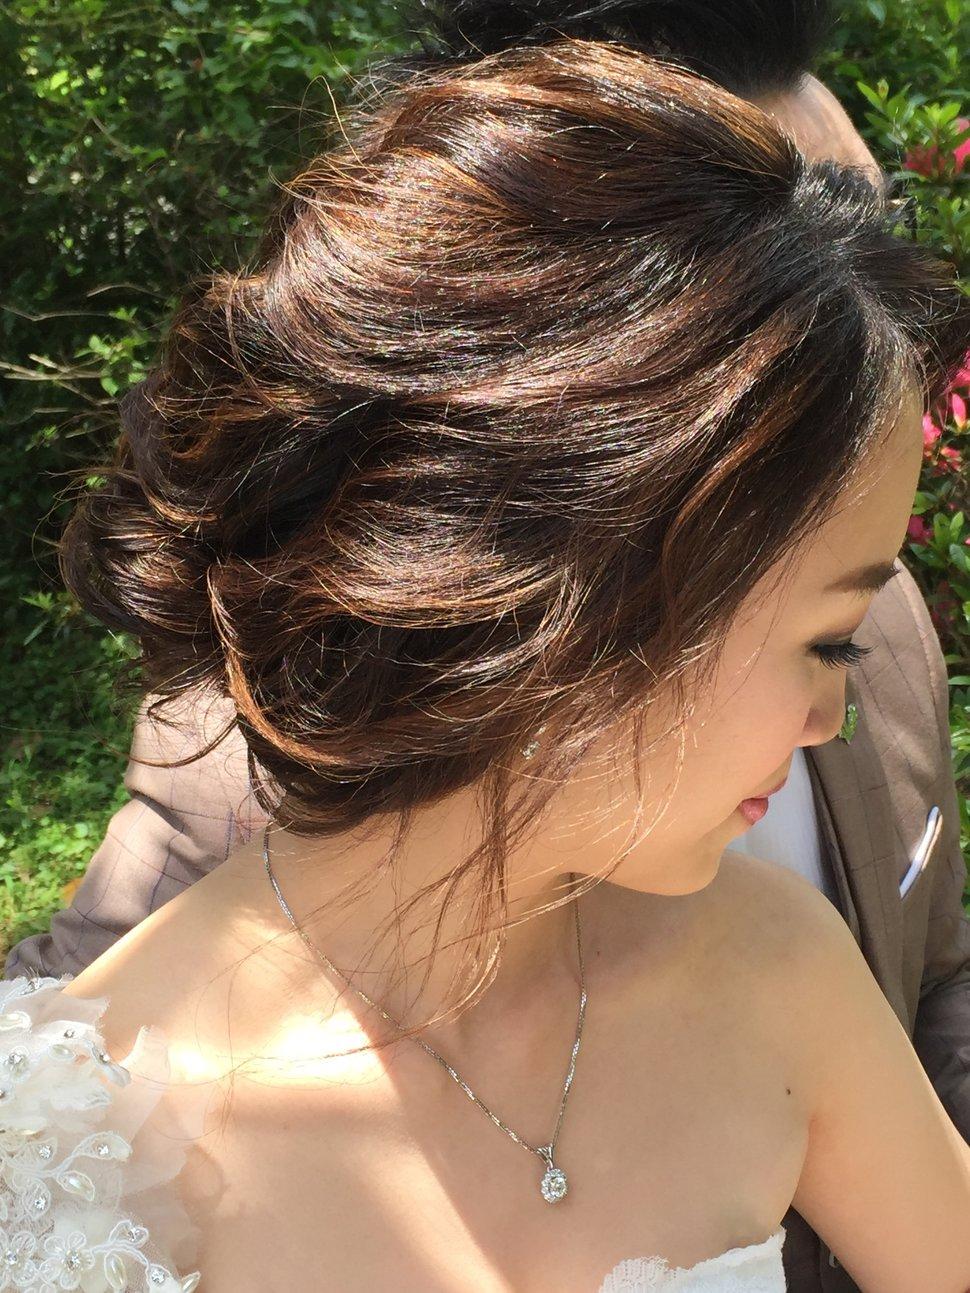 IMG_8997 - Jojo chen Makeup新娘秘書《結婚吧》